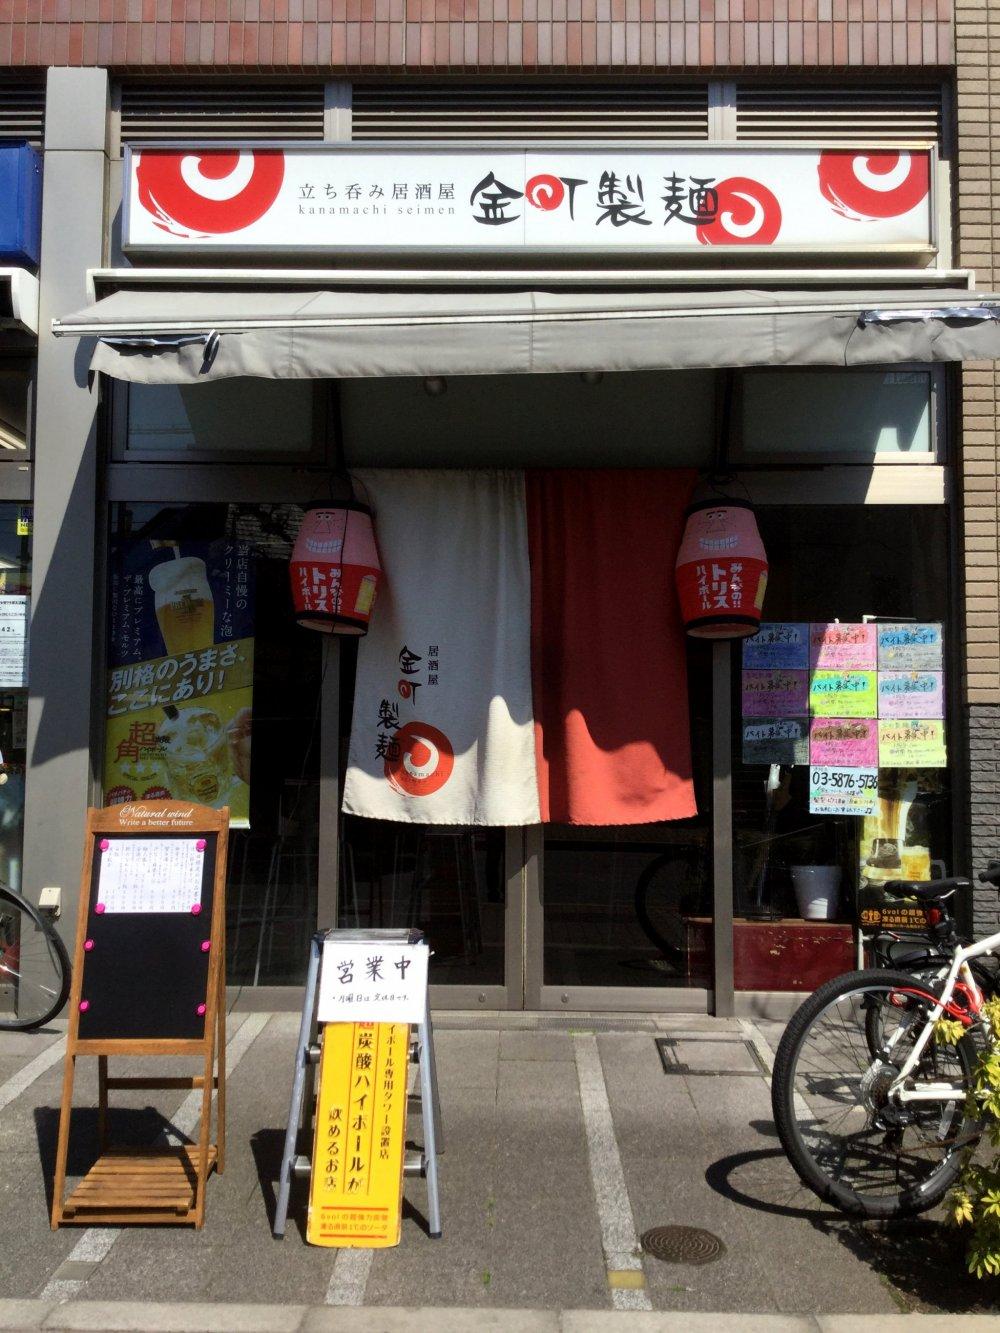 Right in front of Keisei Kanamachi Station